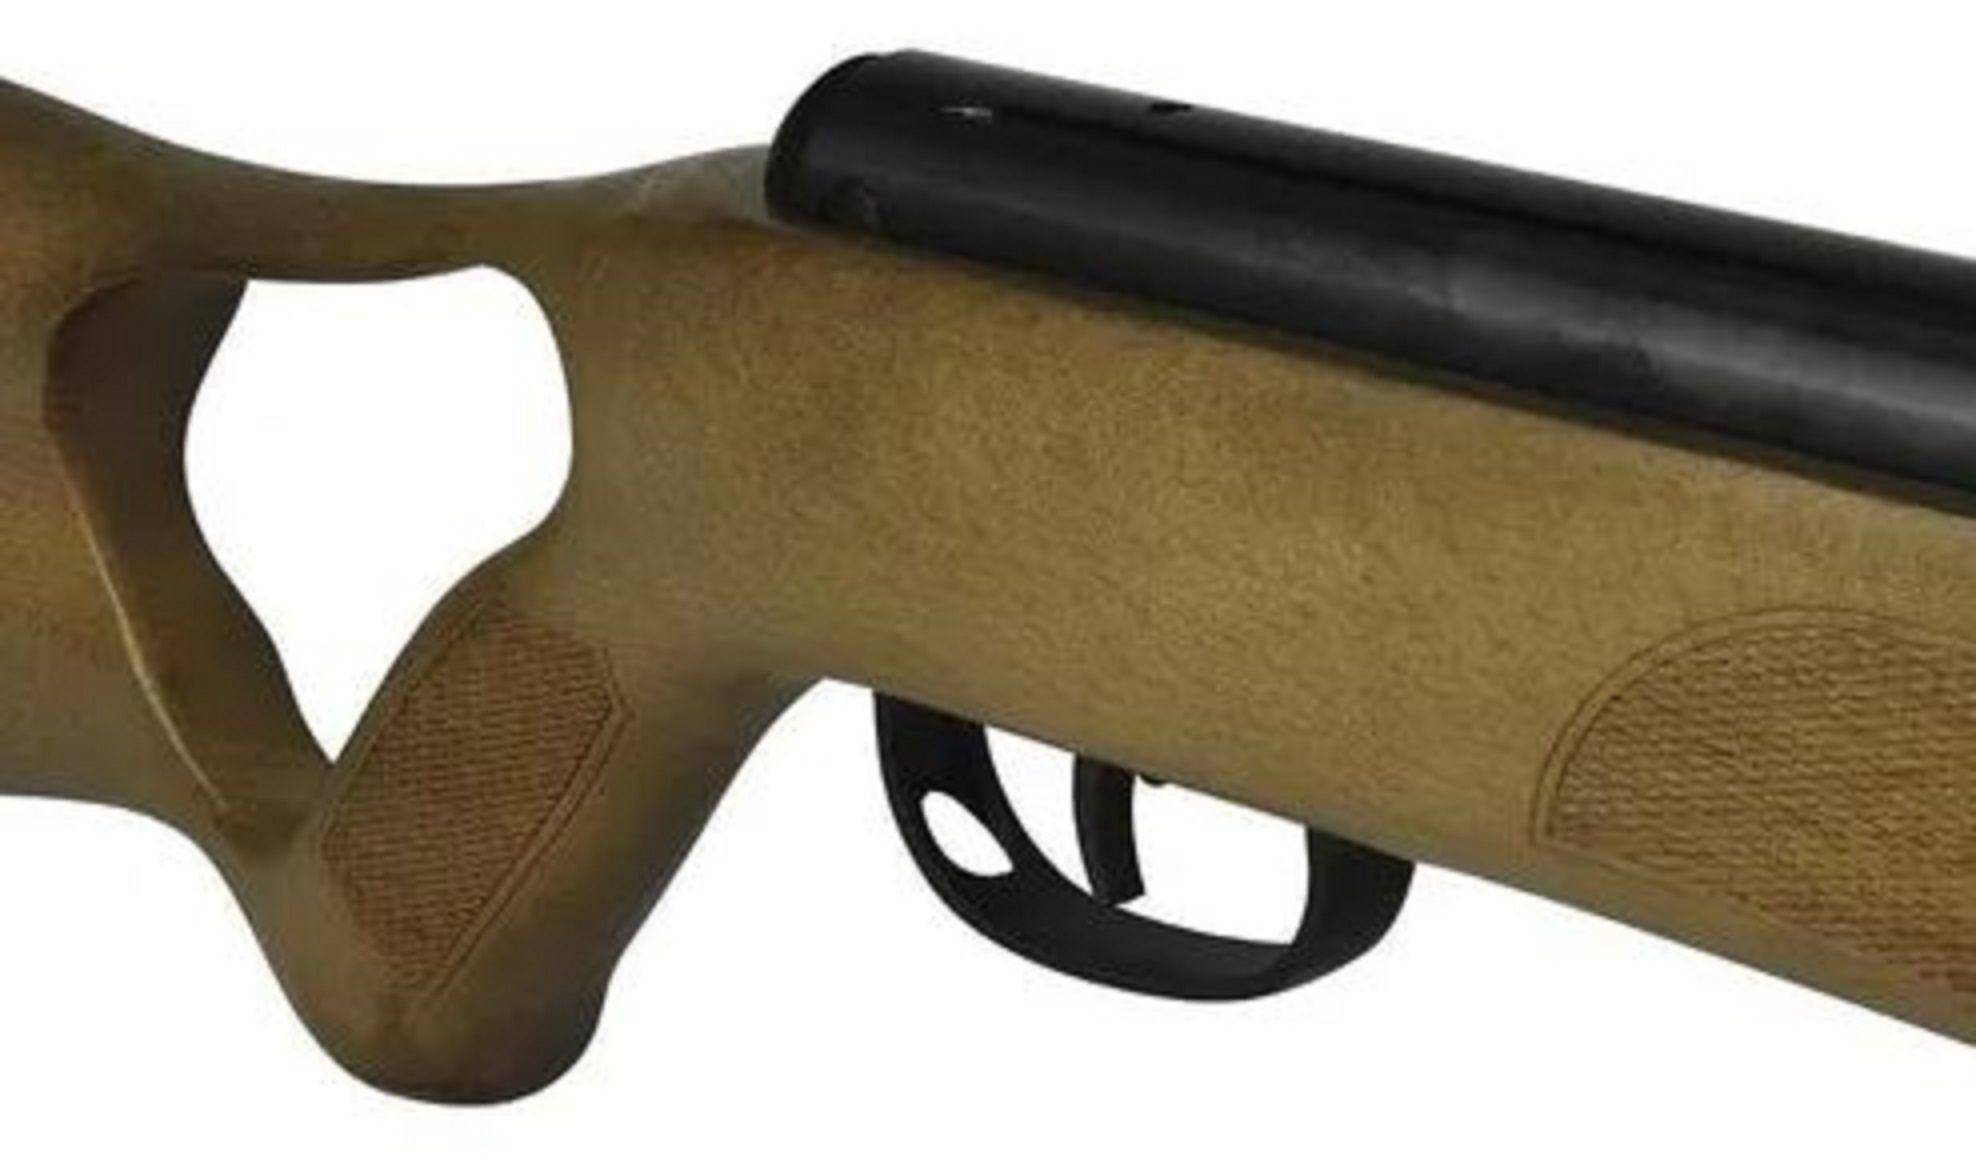 Carabina de Pressão CBC 5.5 B19-Z Nitro